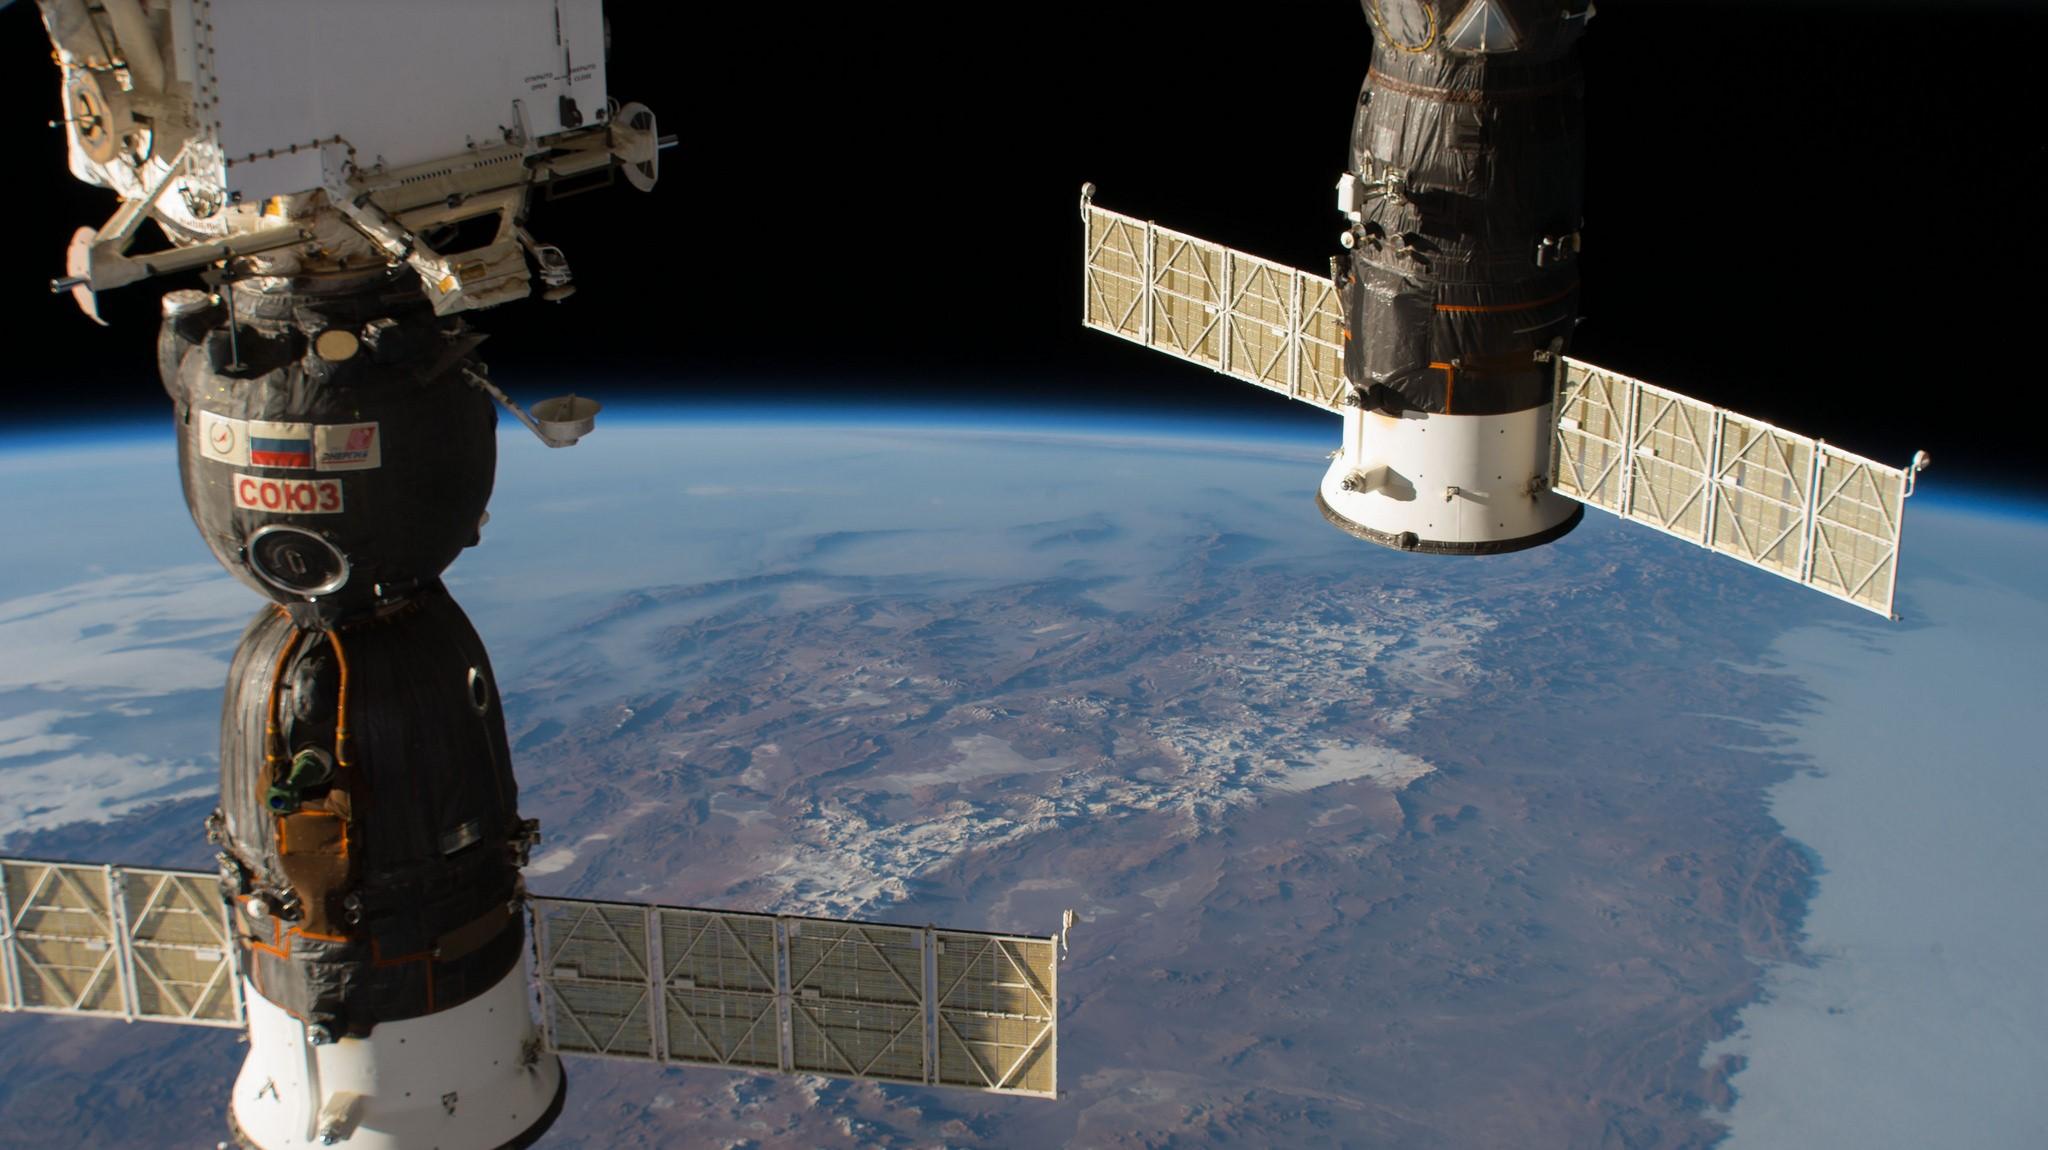 Soyuz MS-09, left, is docked to the Rassvet module. The leak origonated from the upper section of the sapcecraft. Credit: NASA